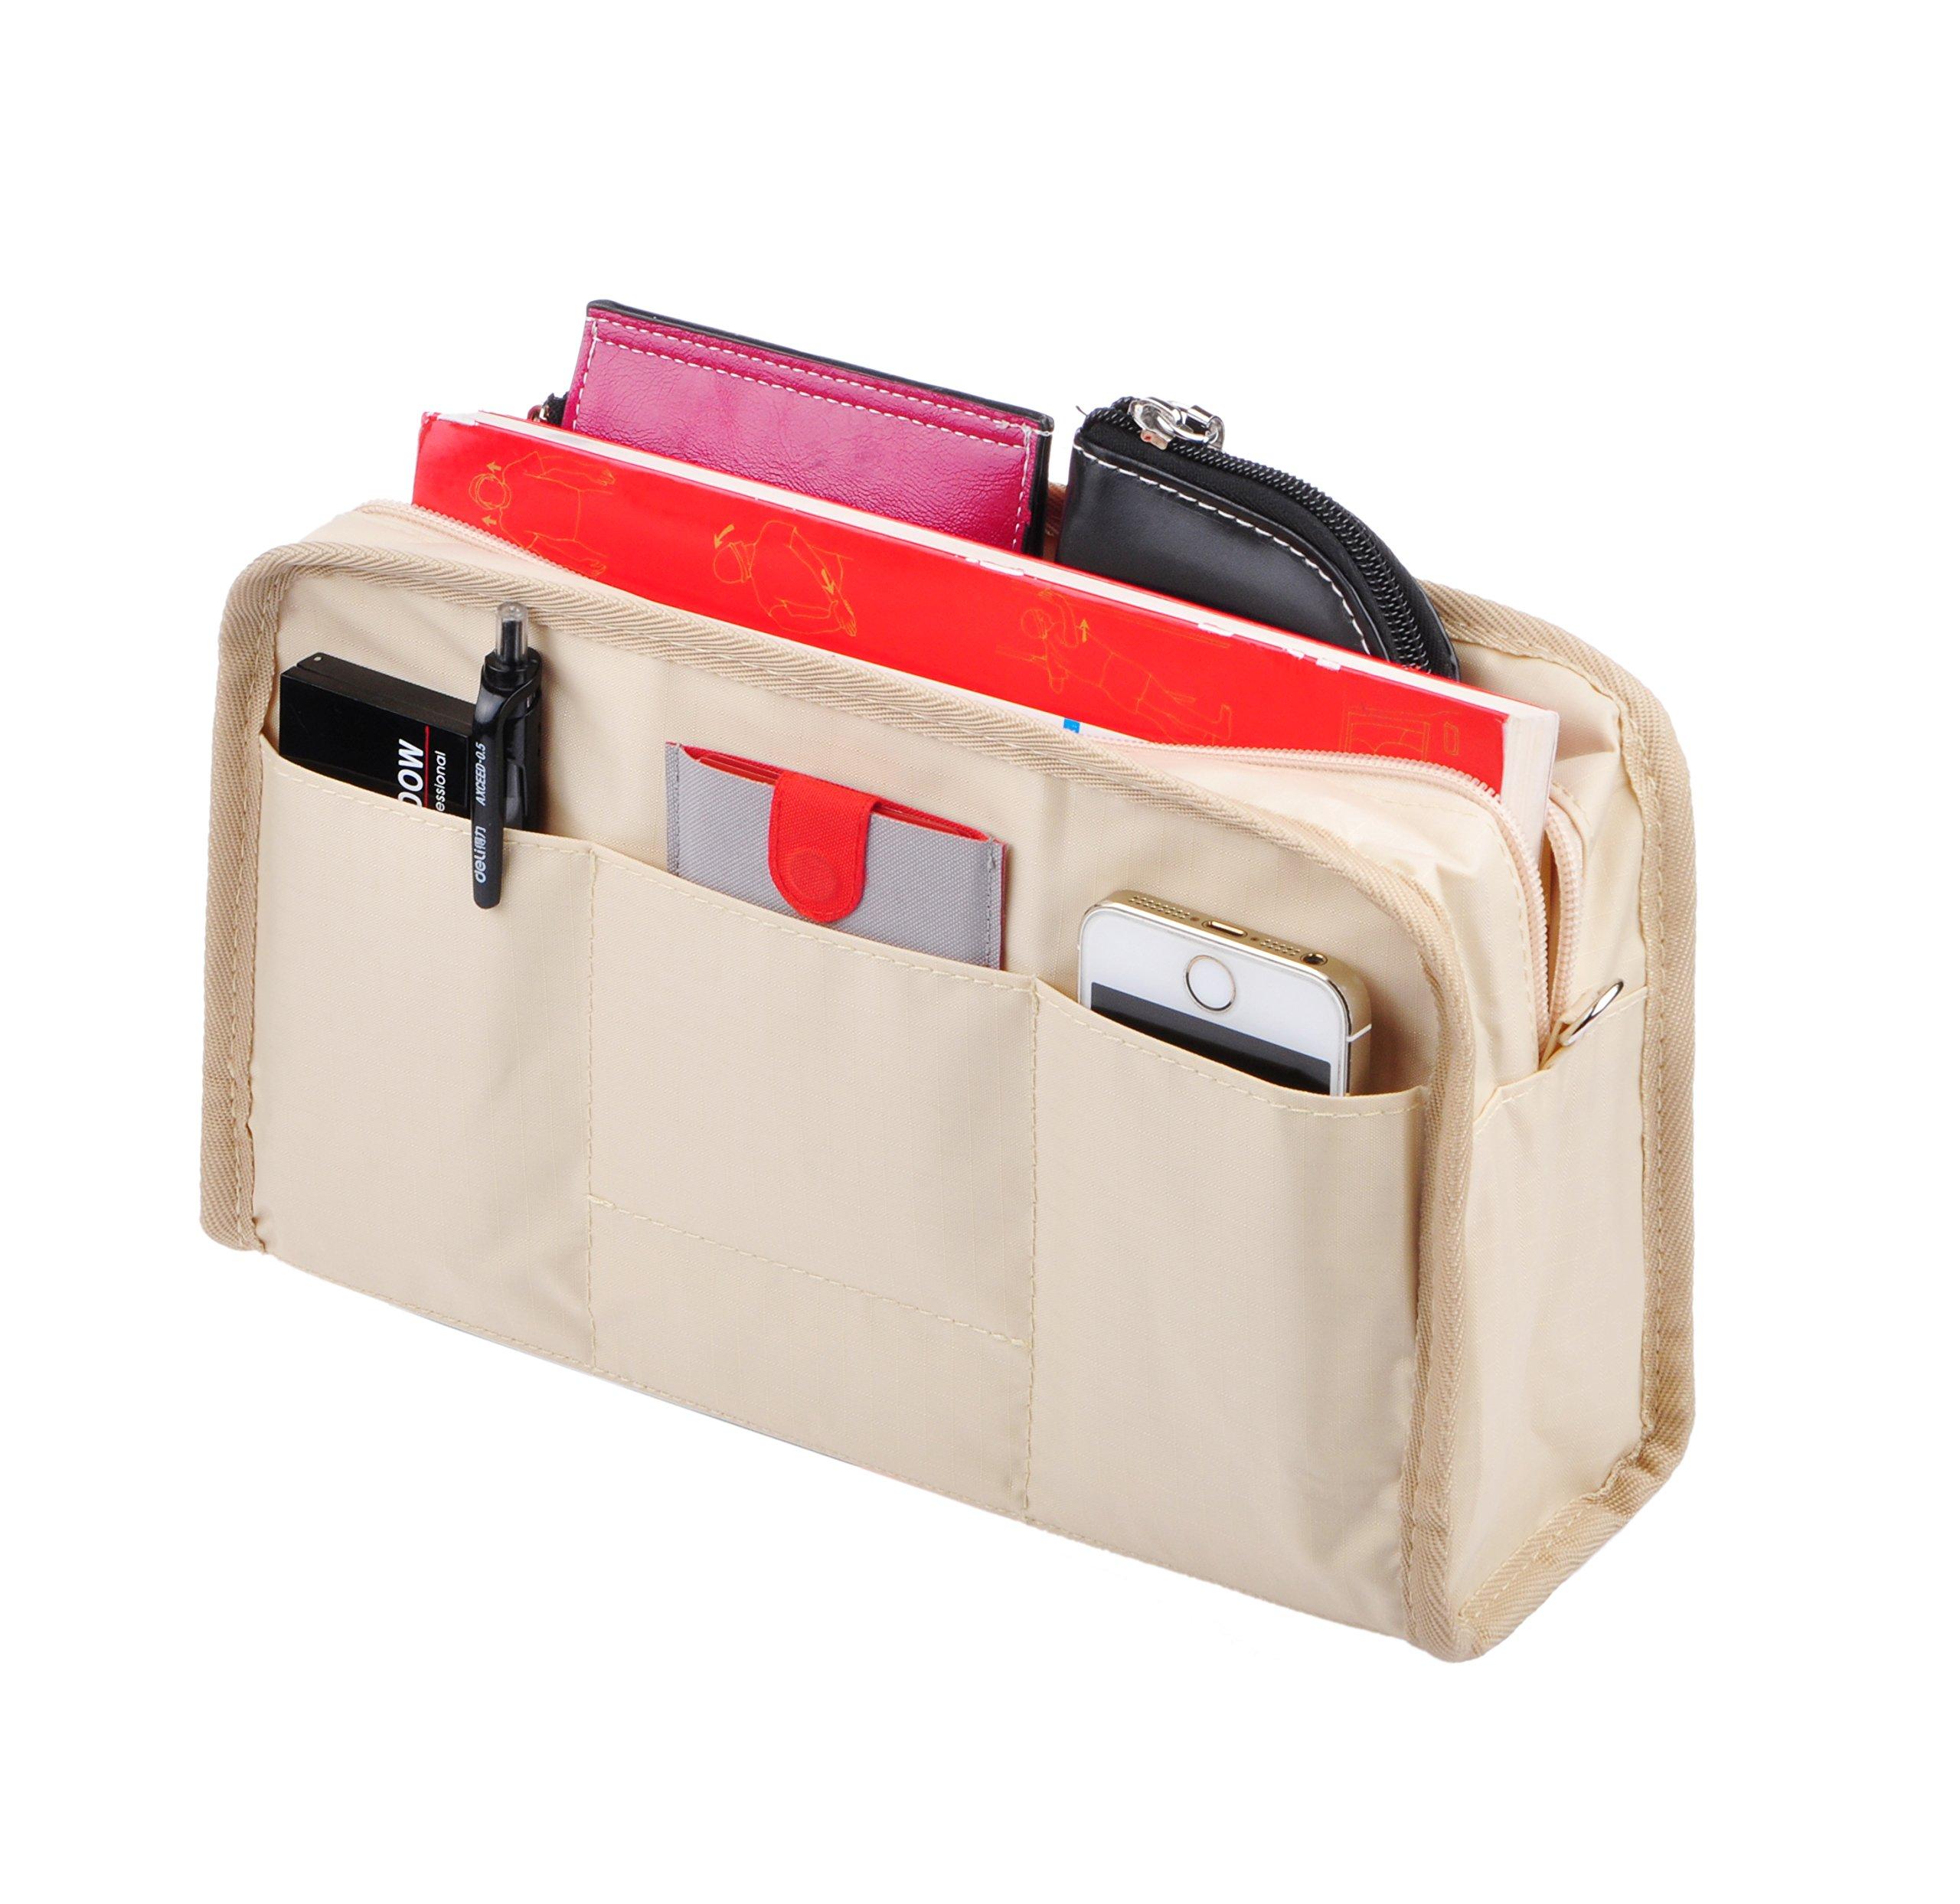 Vercord Sturdy Multi-Pocket Insert Handbag Bag Organizer Water-resistant Large Zipper Bag In Bag, Beige